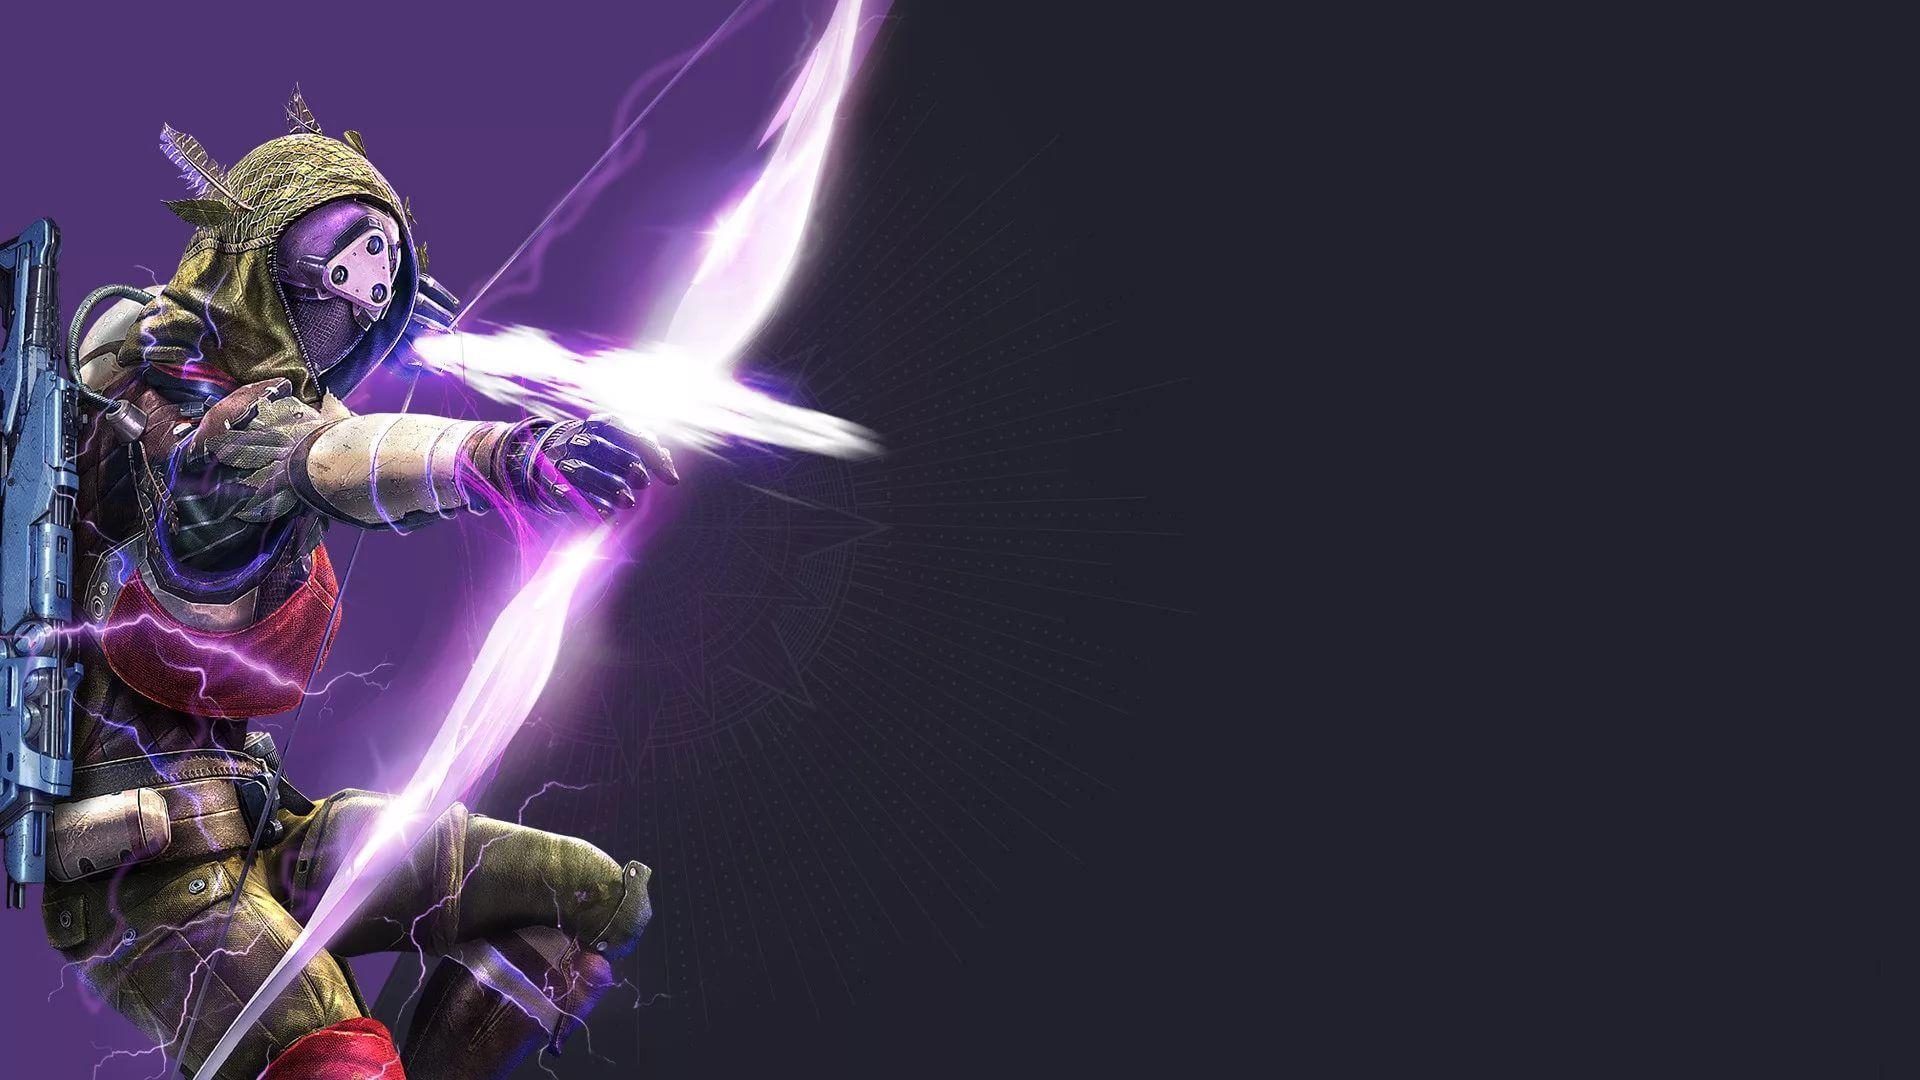 Destiny Hunter download free wallpaper image search